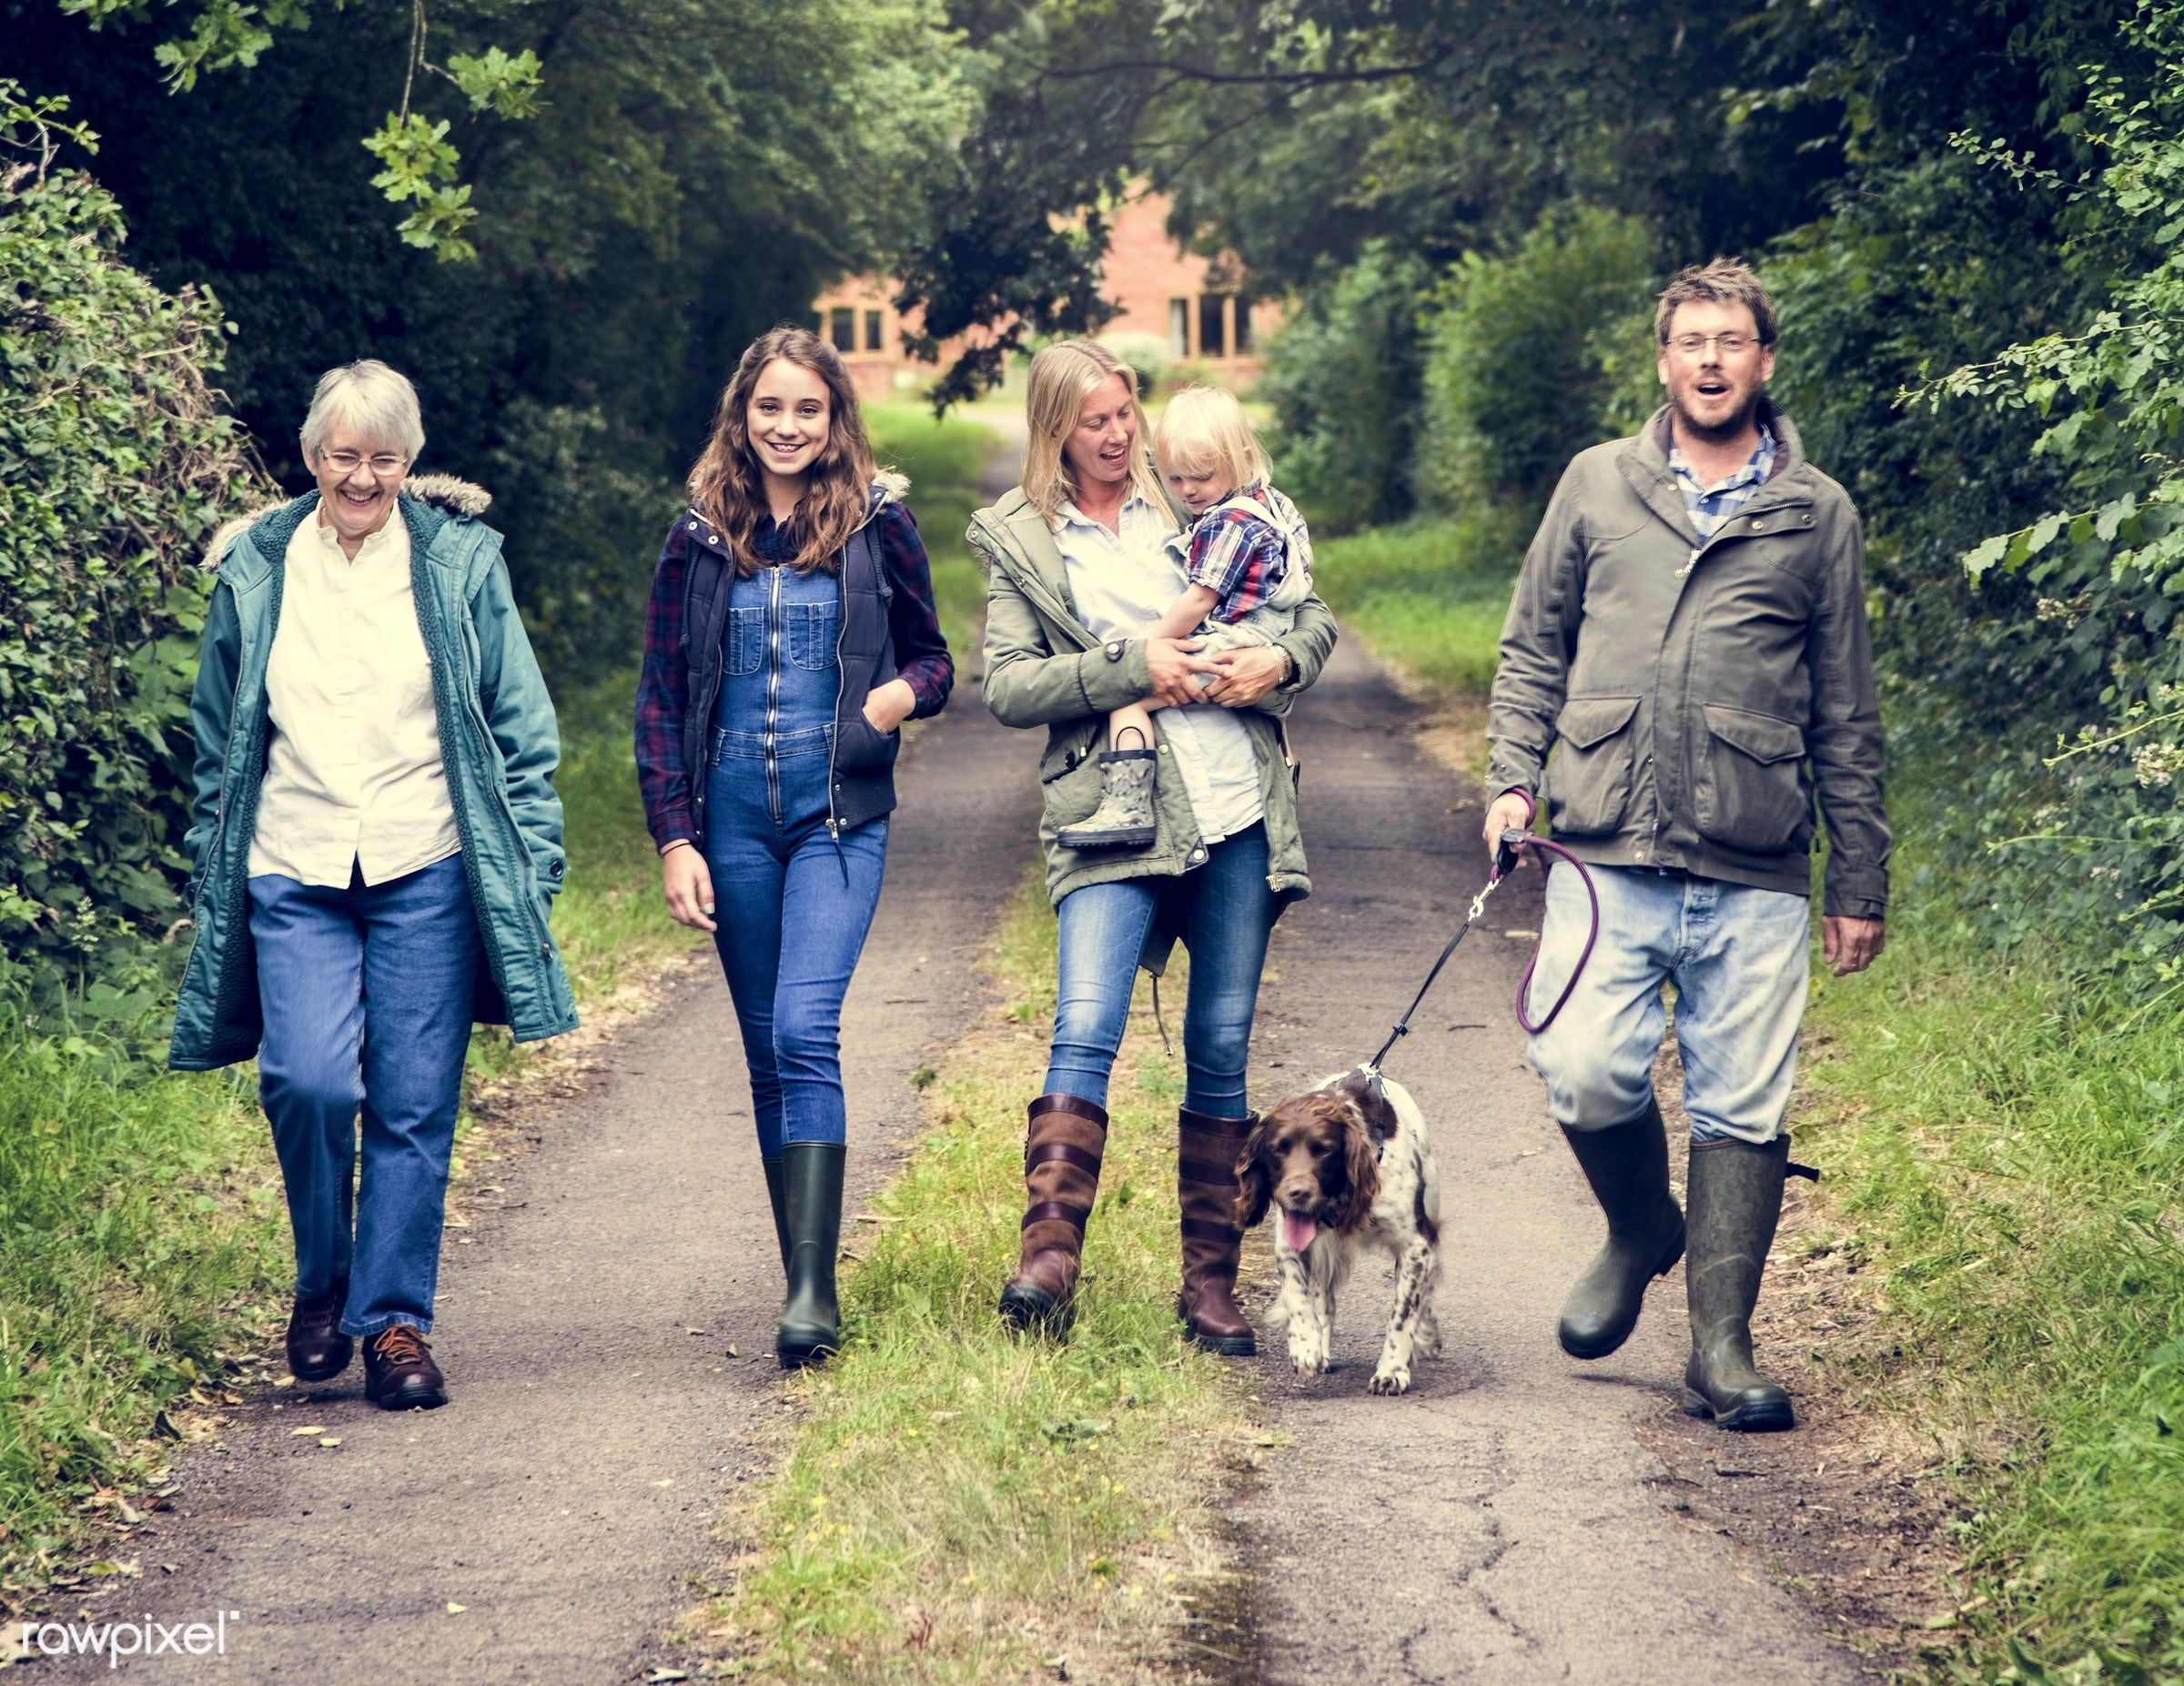 bonding, care, casual, cheerful, childhood, children, cocker spaniel, daughter, dog, enjoyment, environmental, family,...